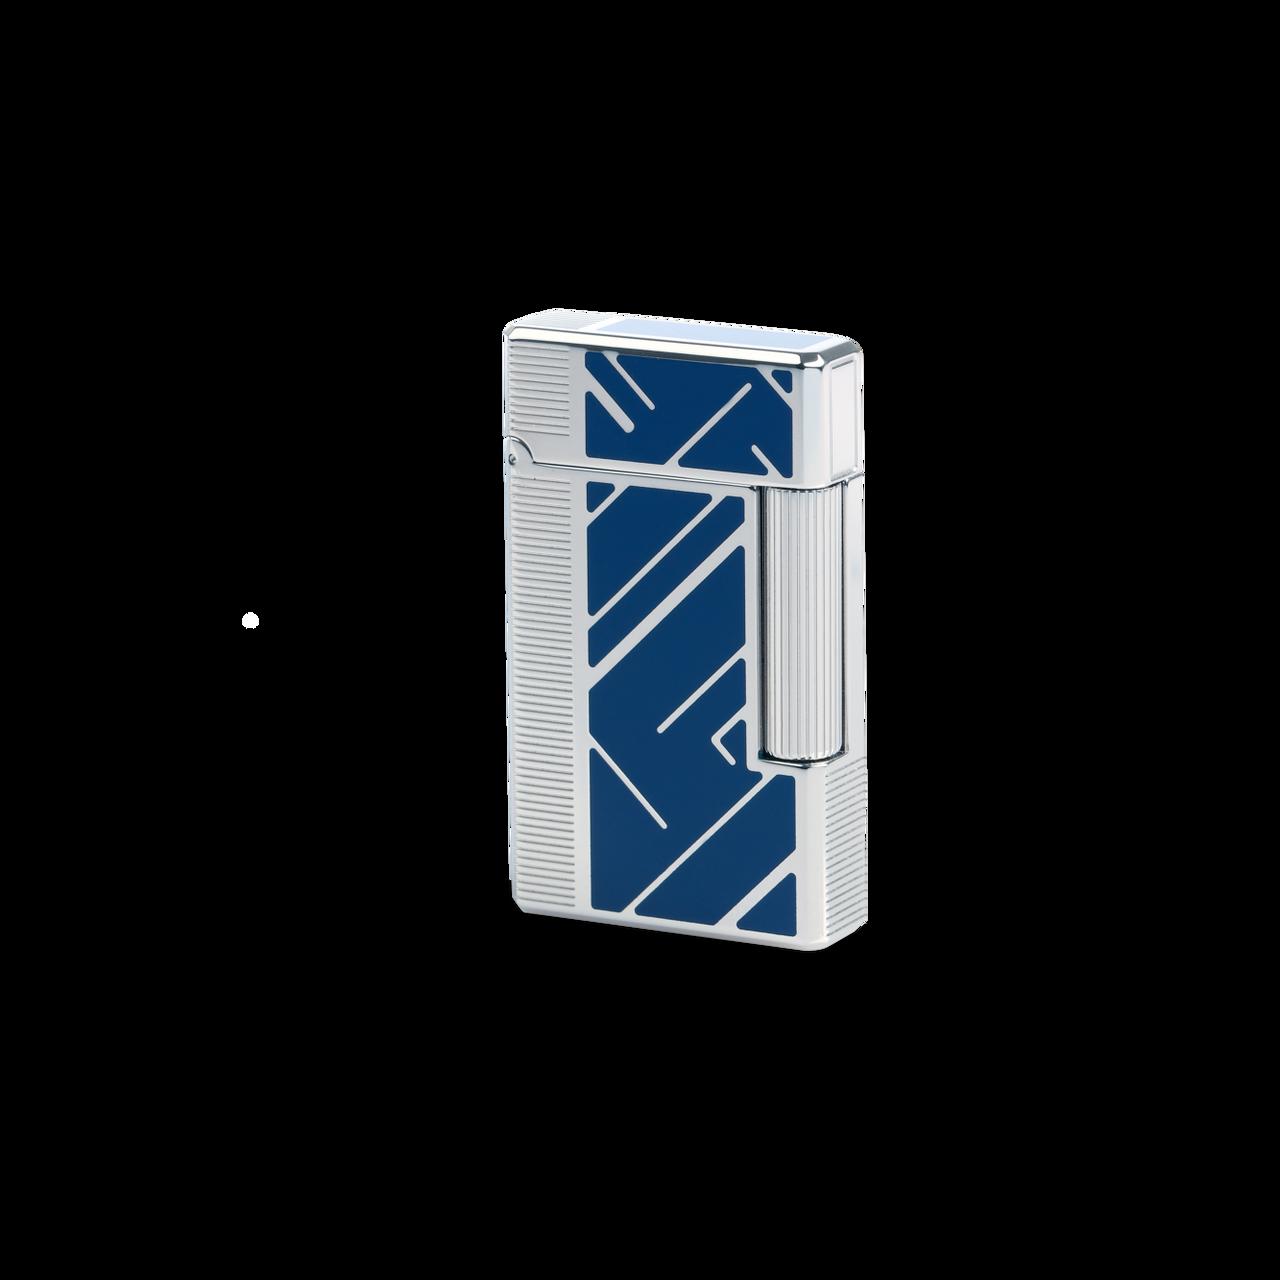 Davidoff Royal Release Lighter